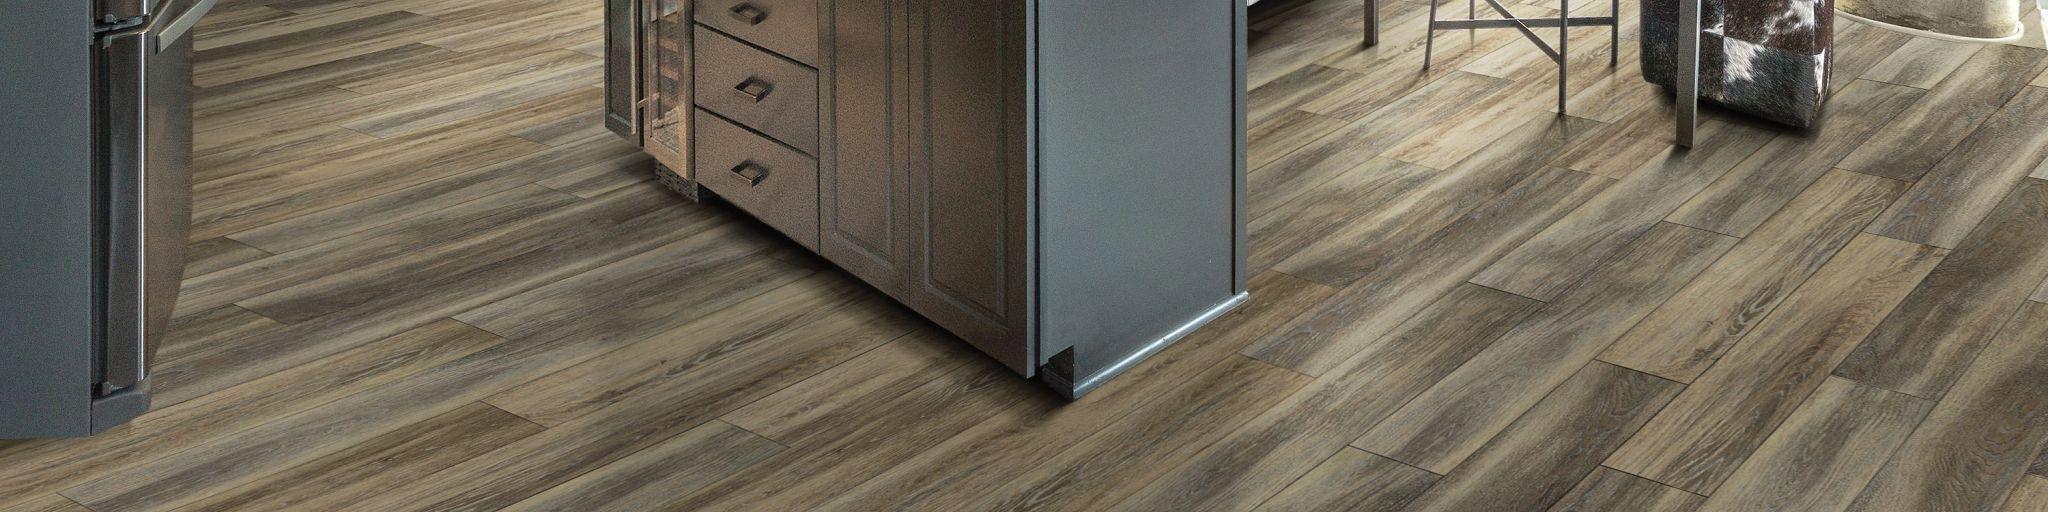 vinyl-floorte-classic-lazio-plus-ve230-00161-sabbia-kitchen-2020